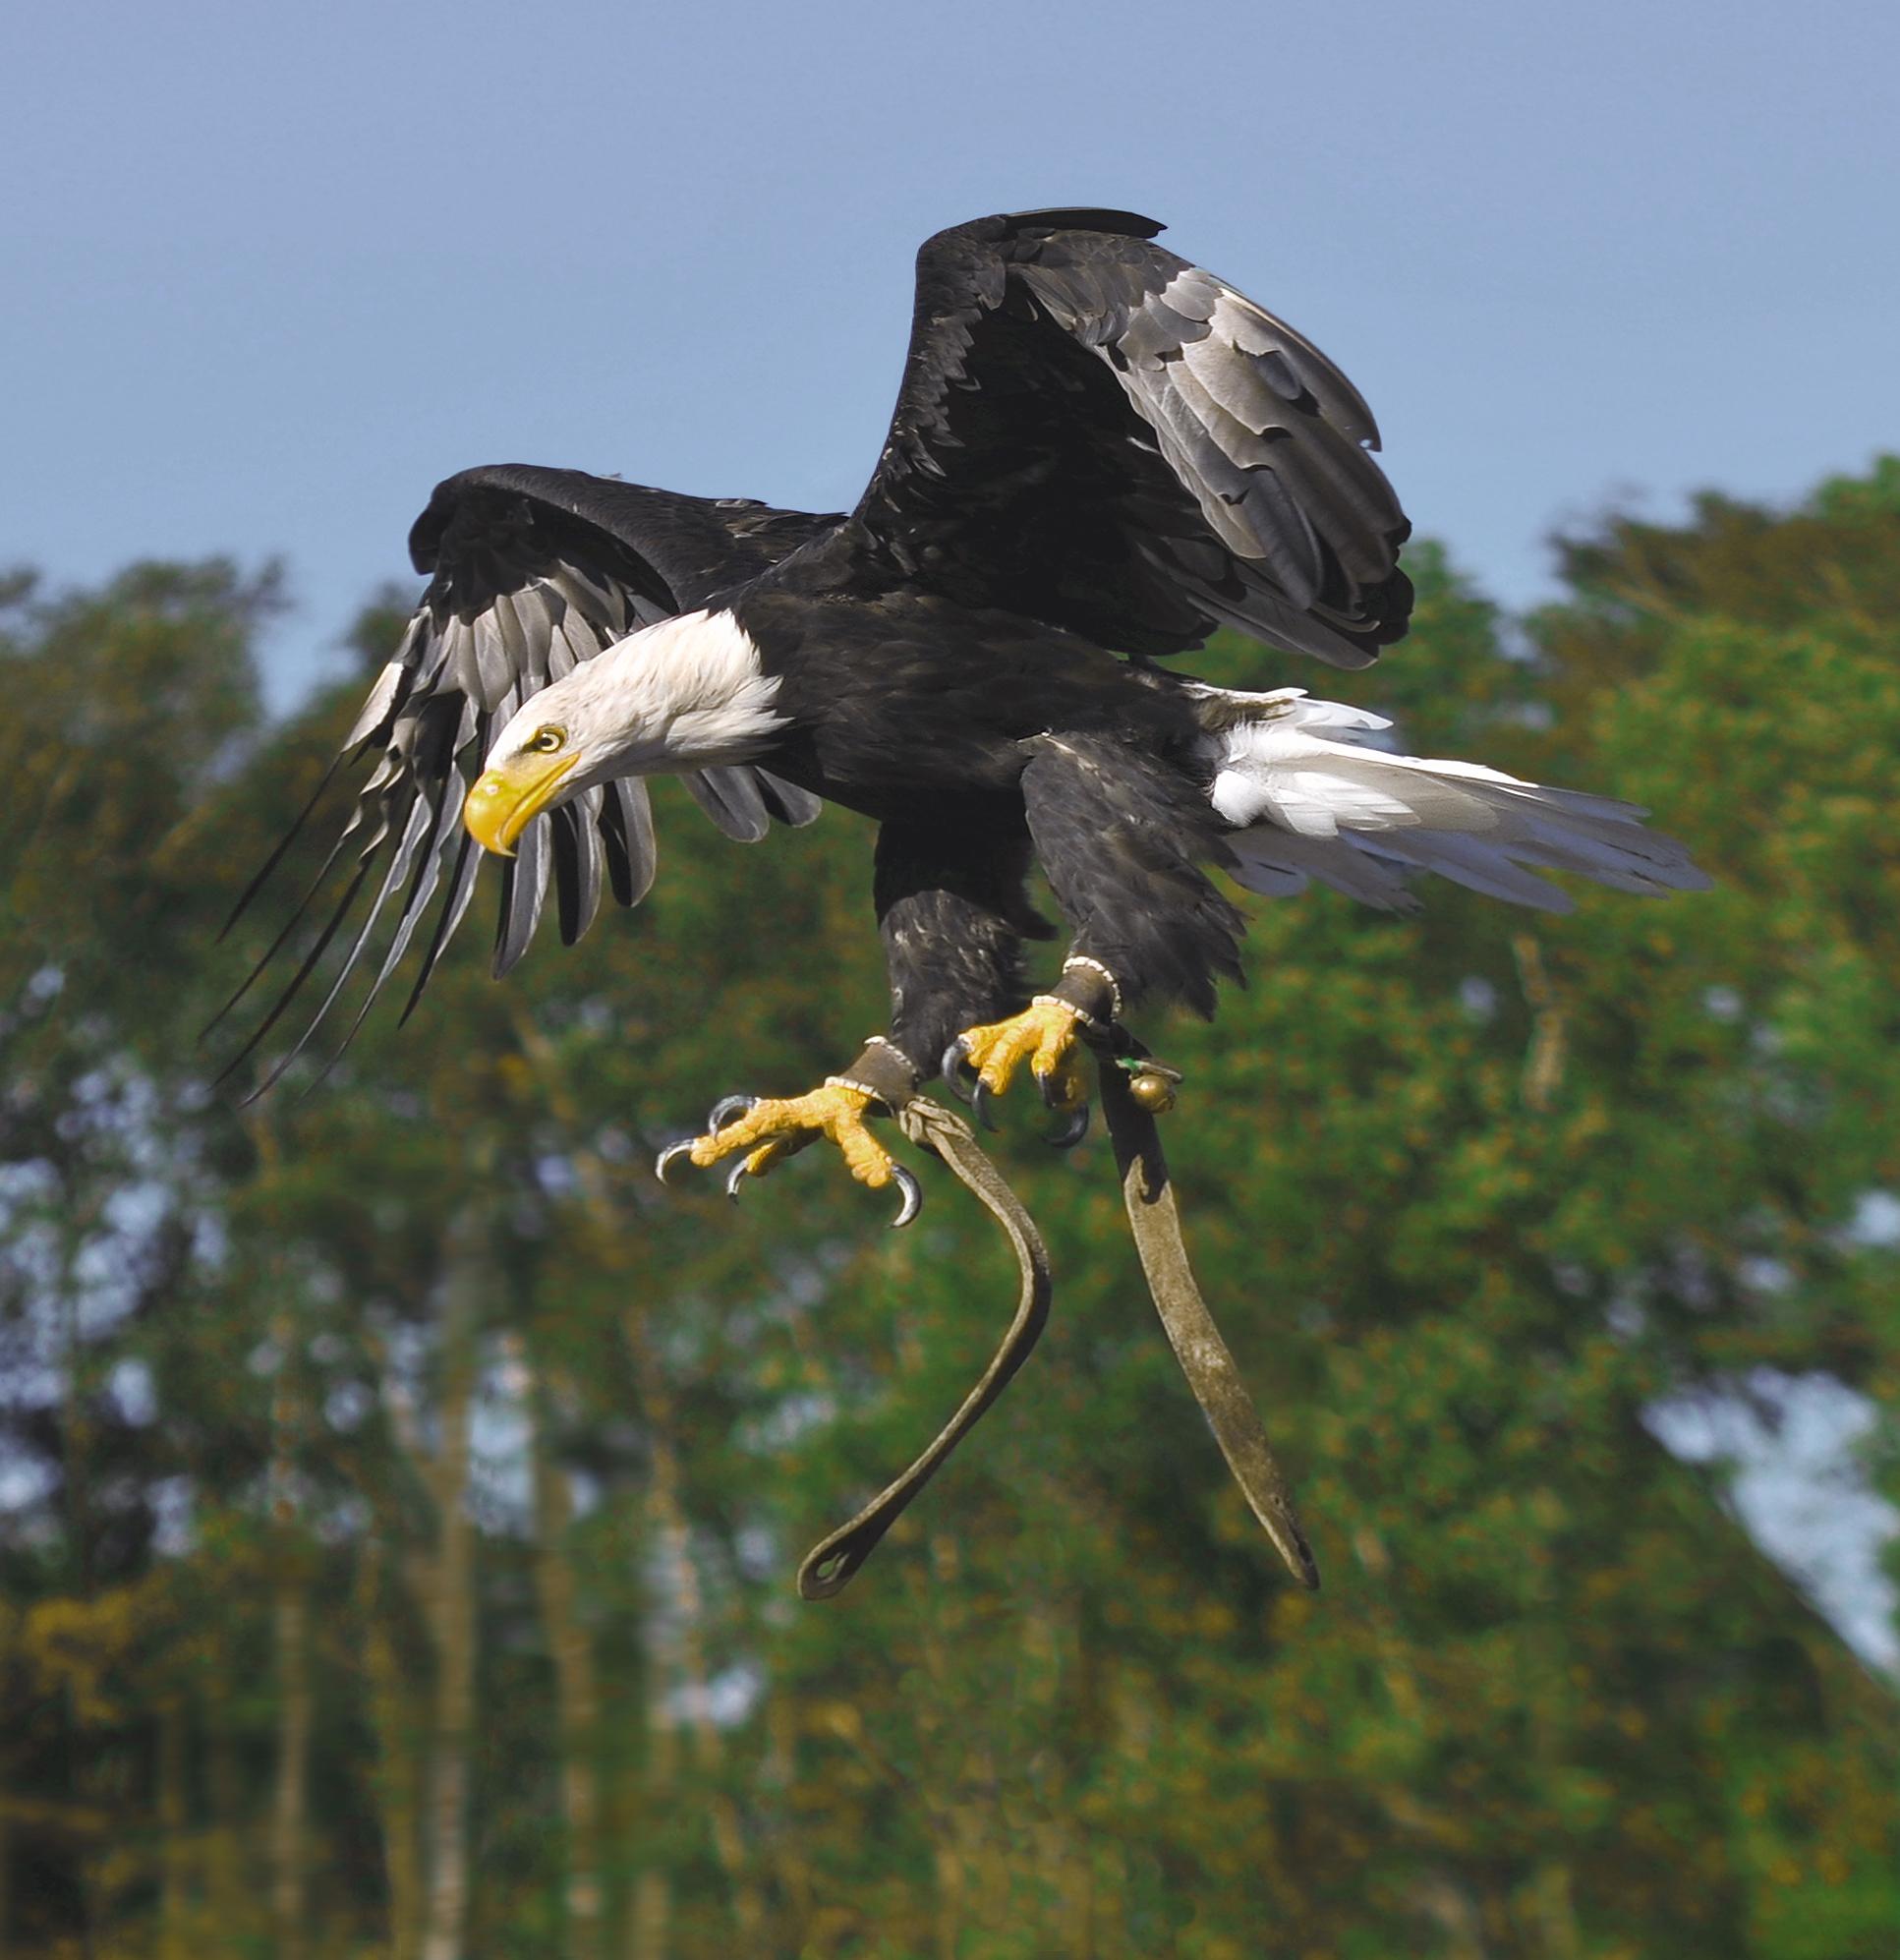 Bald eagle in a nosedive